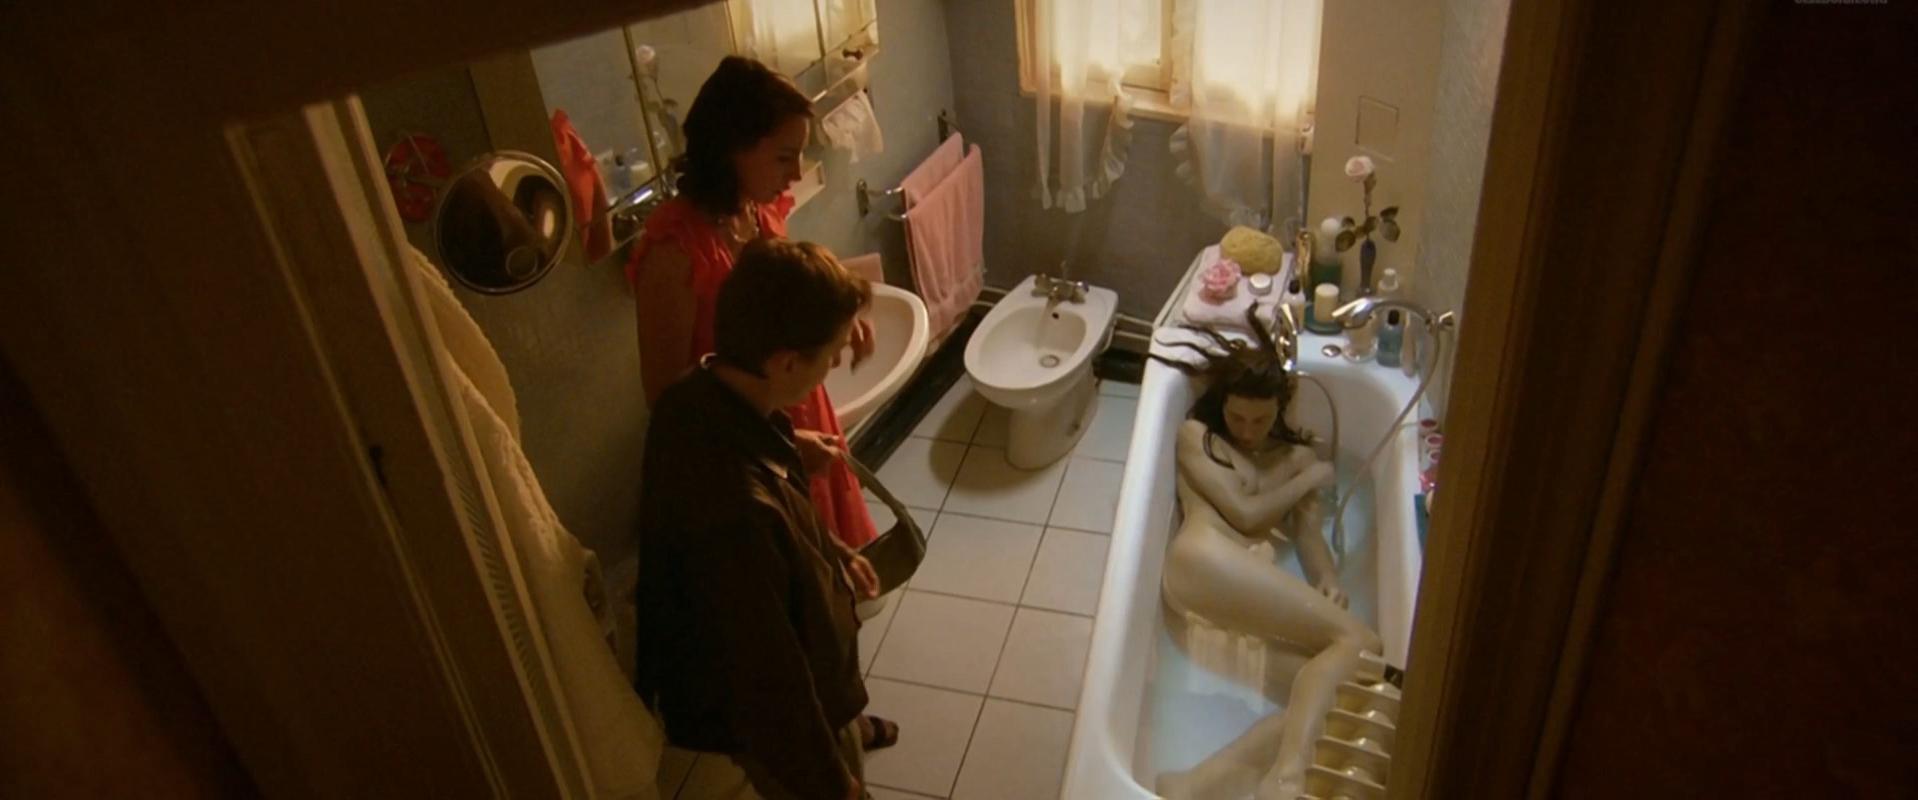 Caroline ducey explicit sex behind romance movie new picture